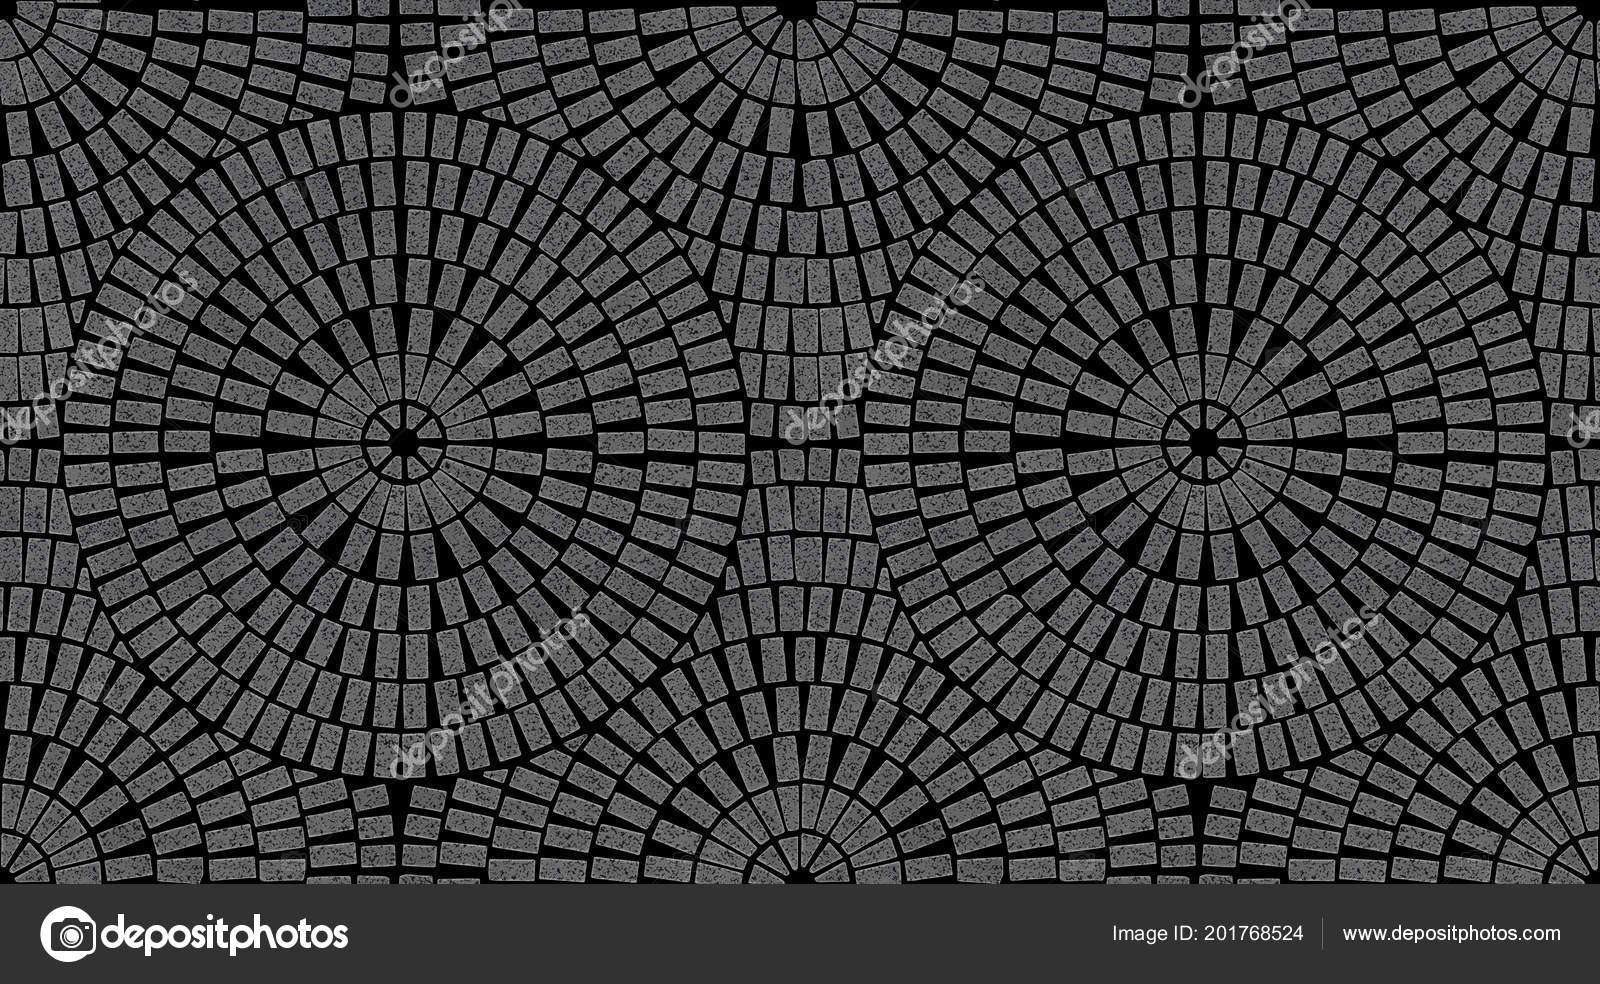 Brick Laying Radial Patterns Patio Paving Stock Photo